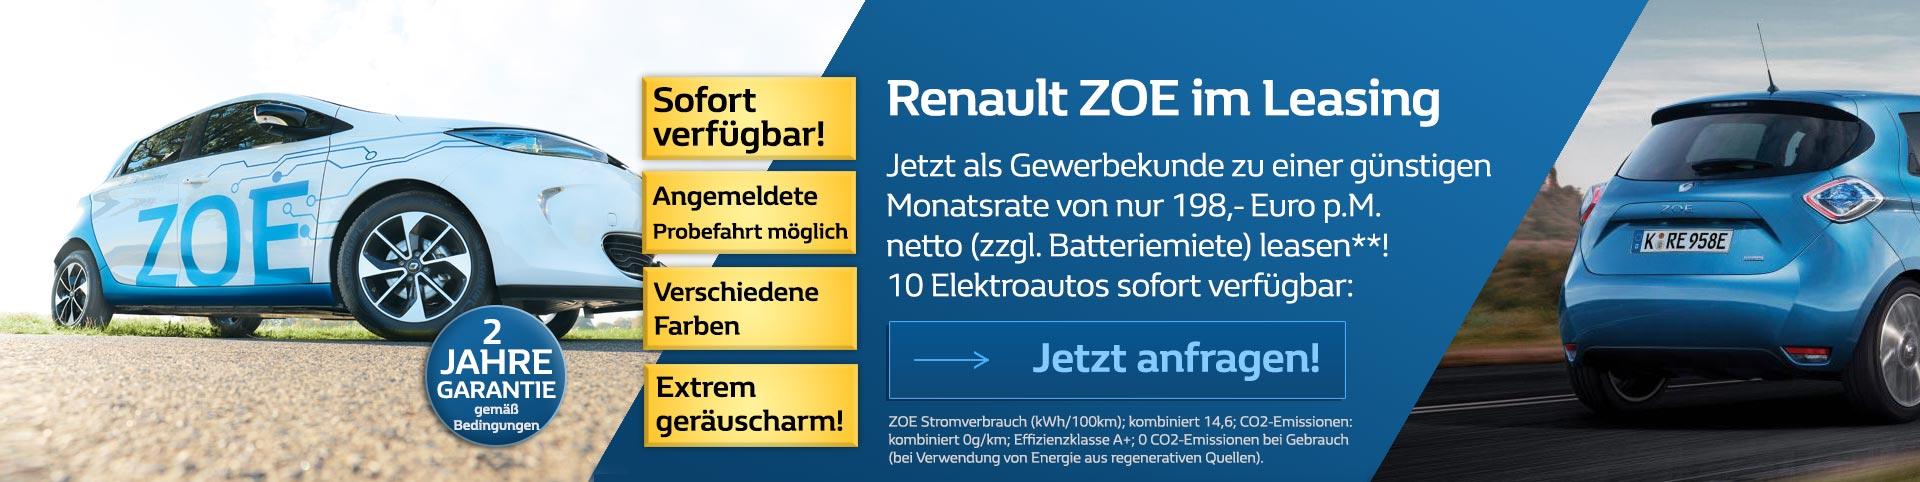 Renault Zoe Leasing bei P&A-Preckel